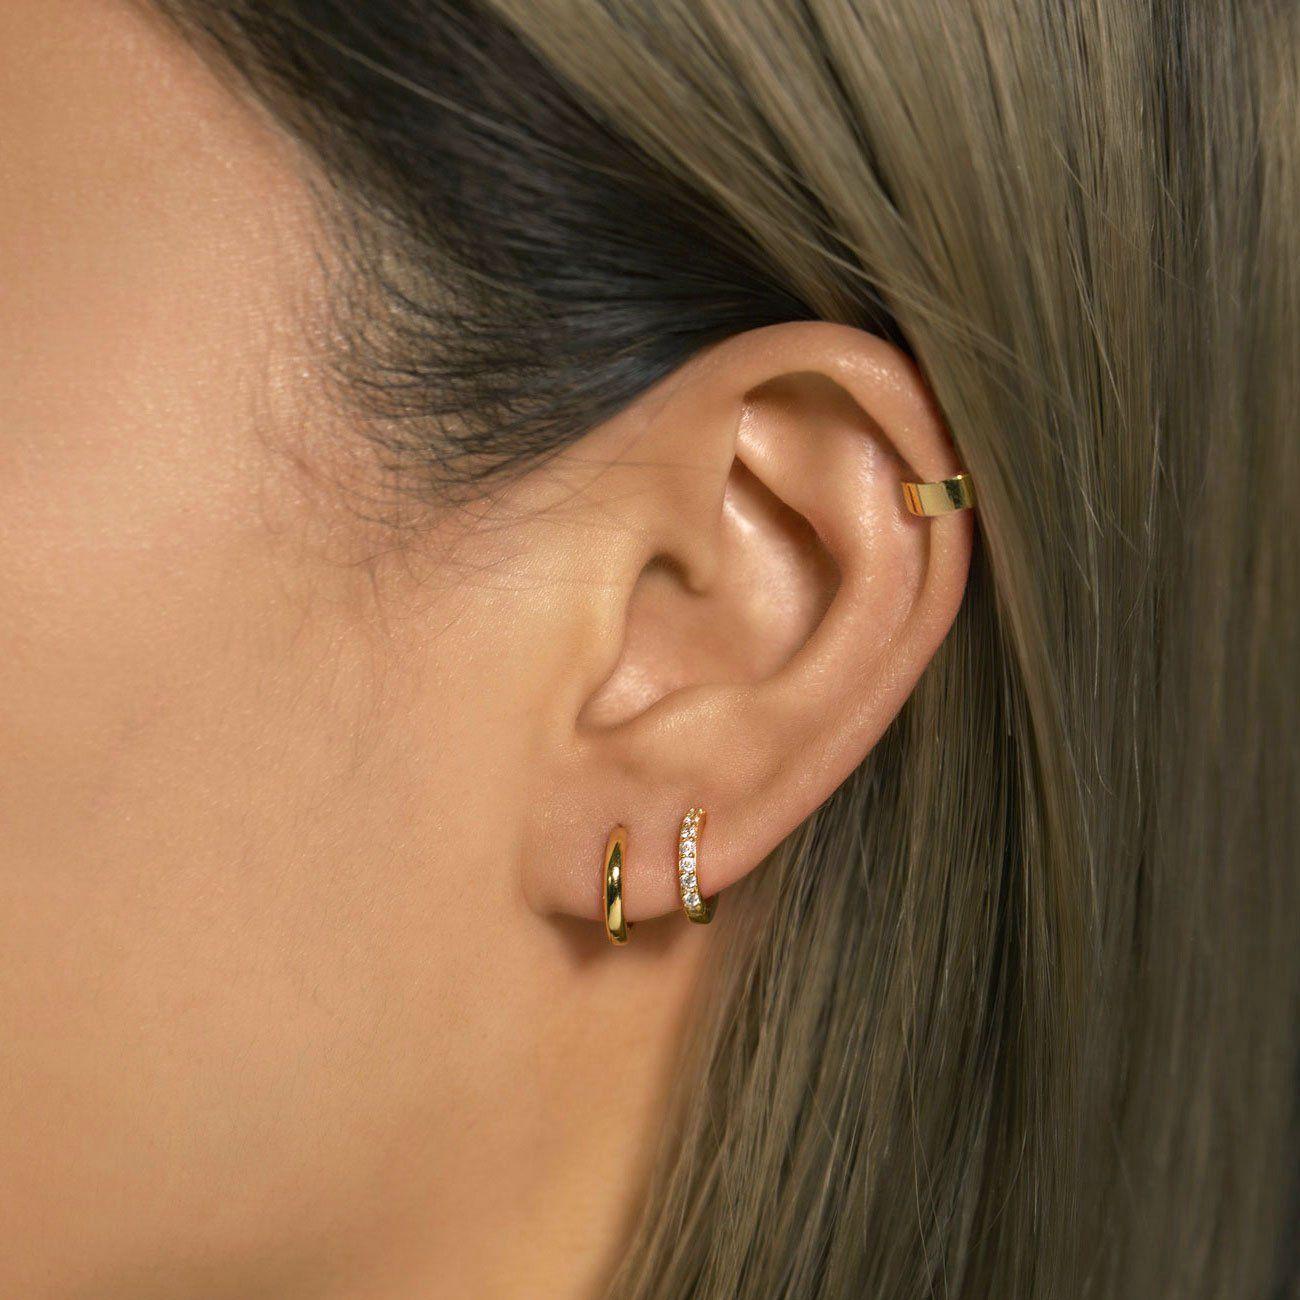 Photo of Pave Huggie Earrings